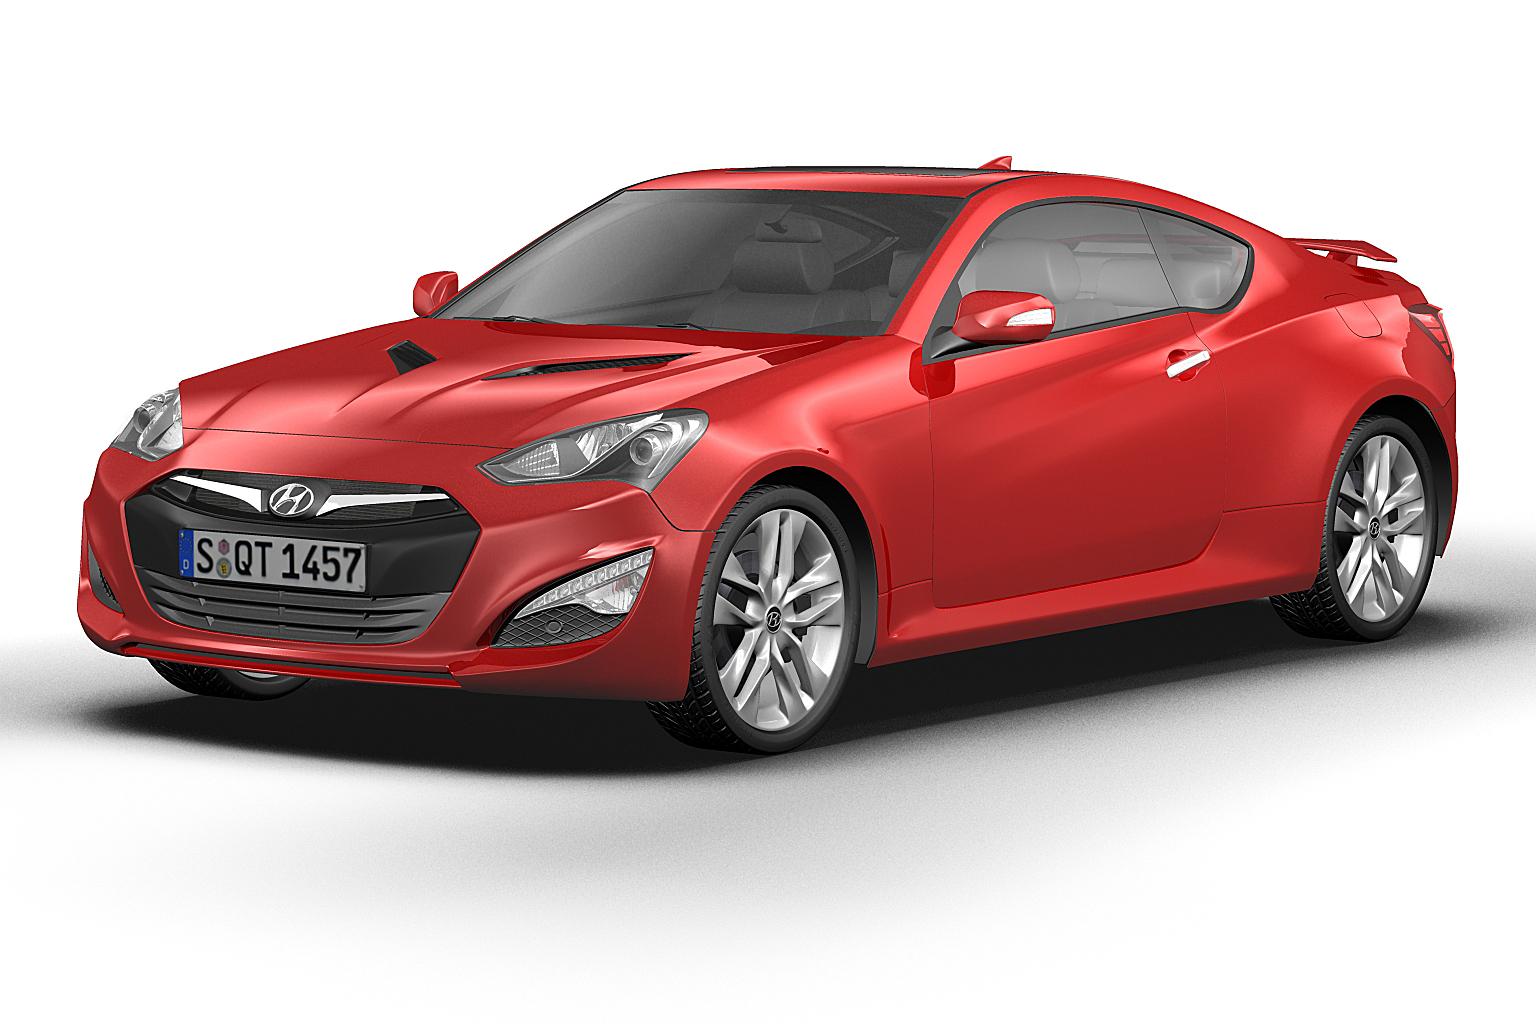 2014 Hyundai Genesis Coupe #9 Hyundai Genesis Coupe #9